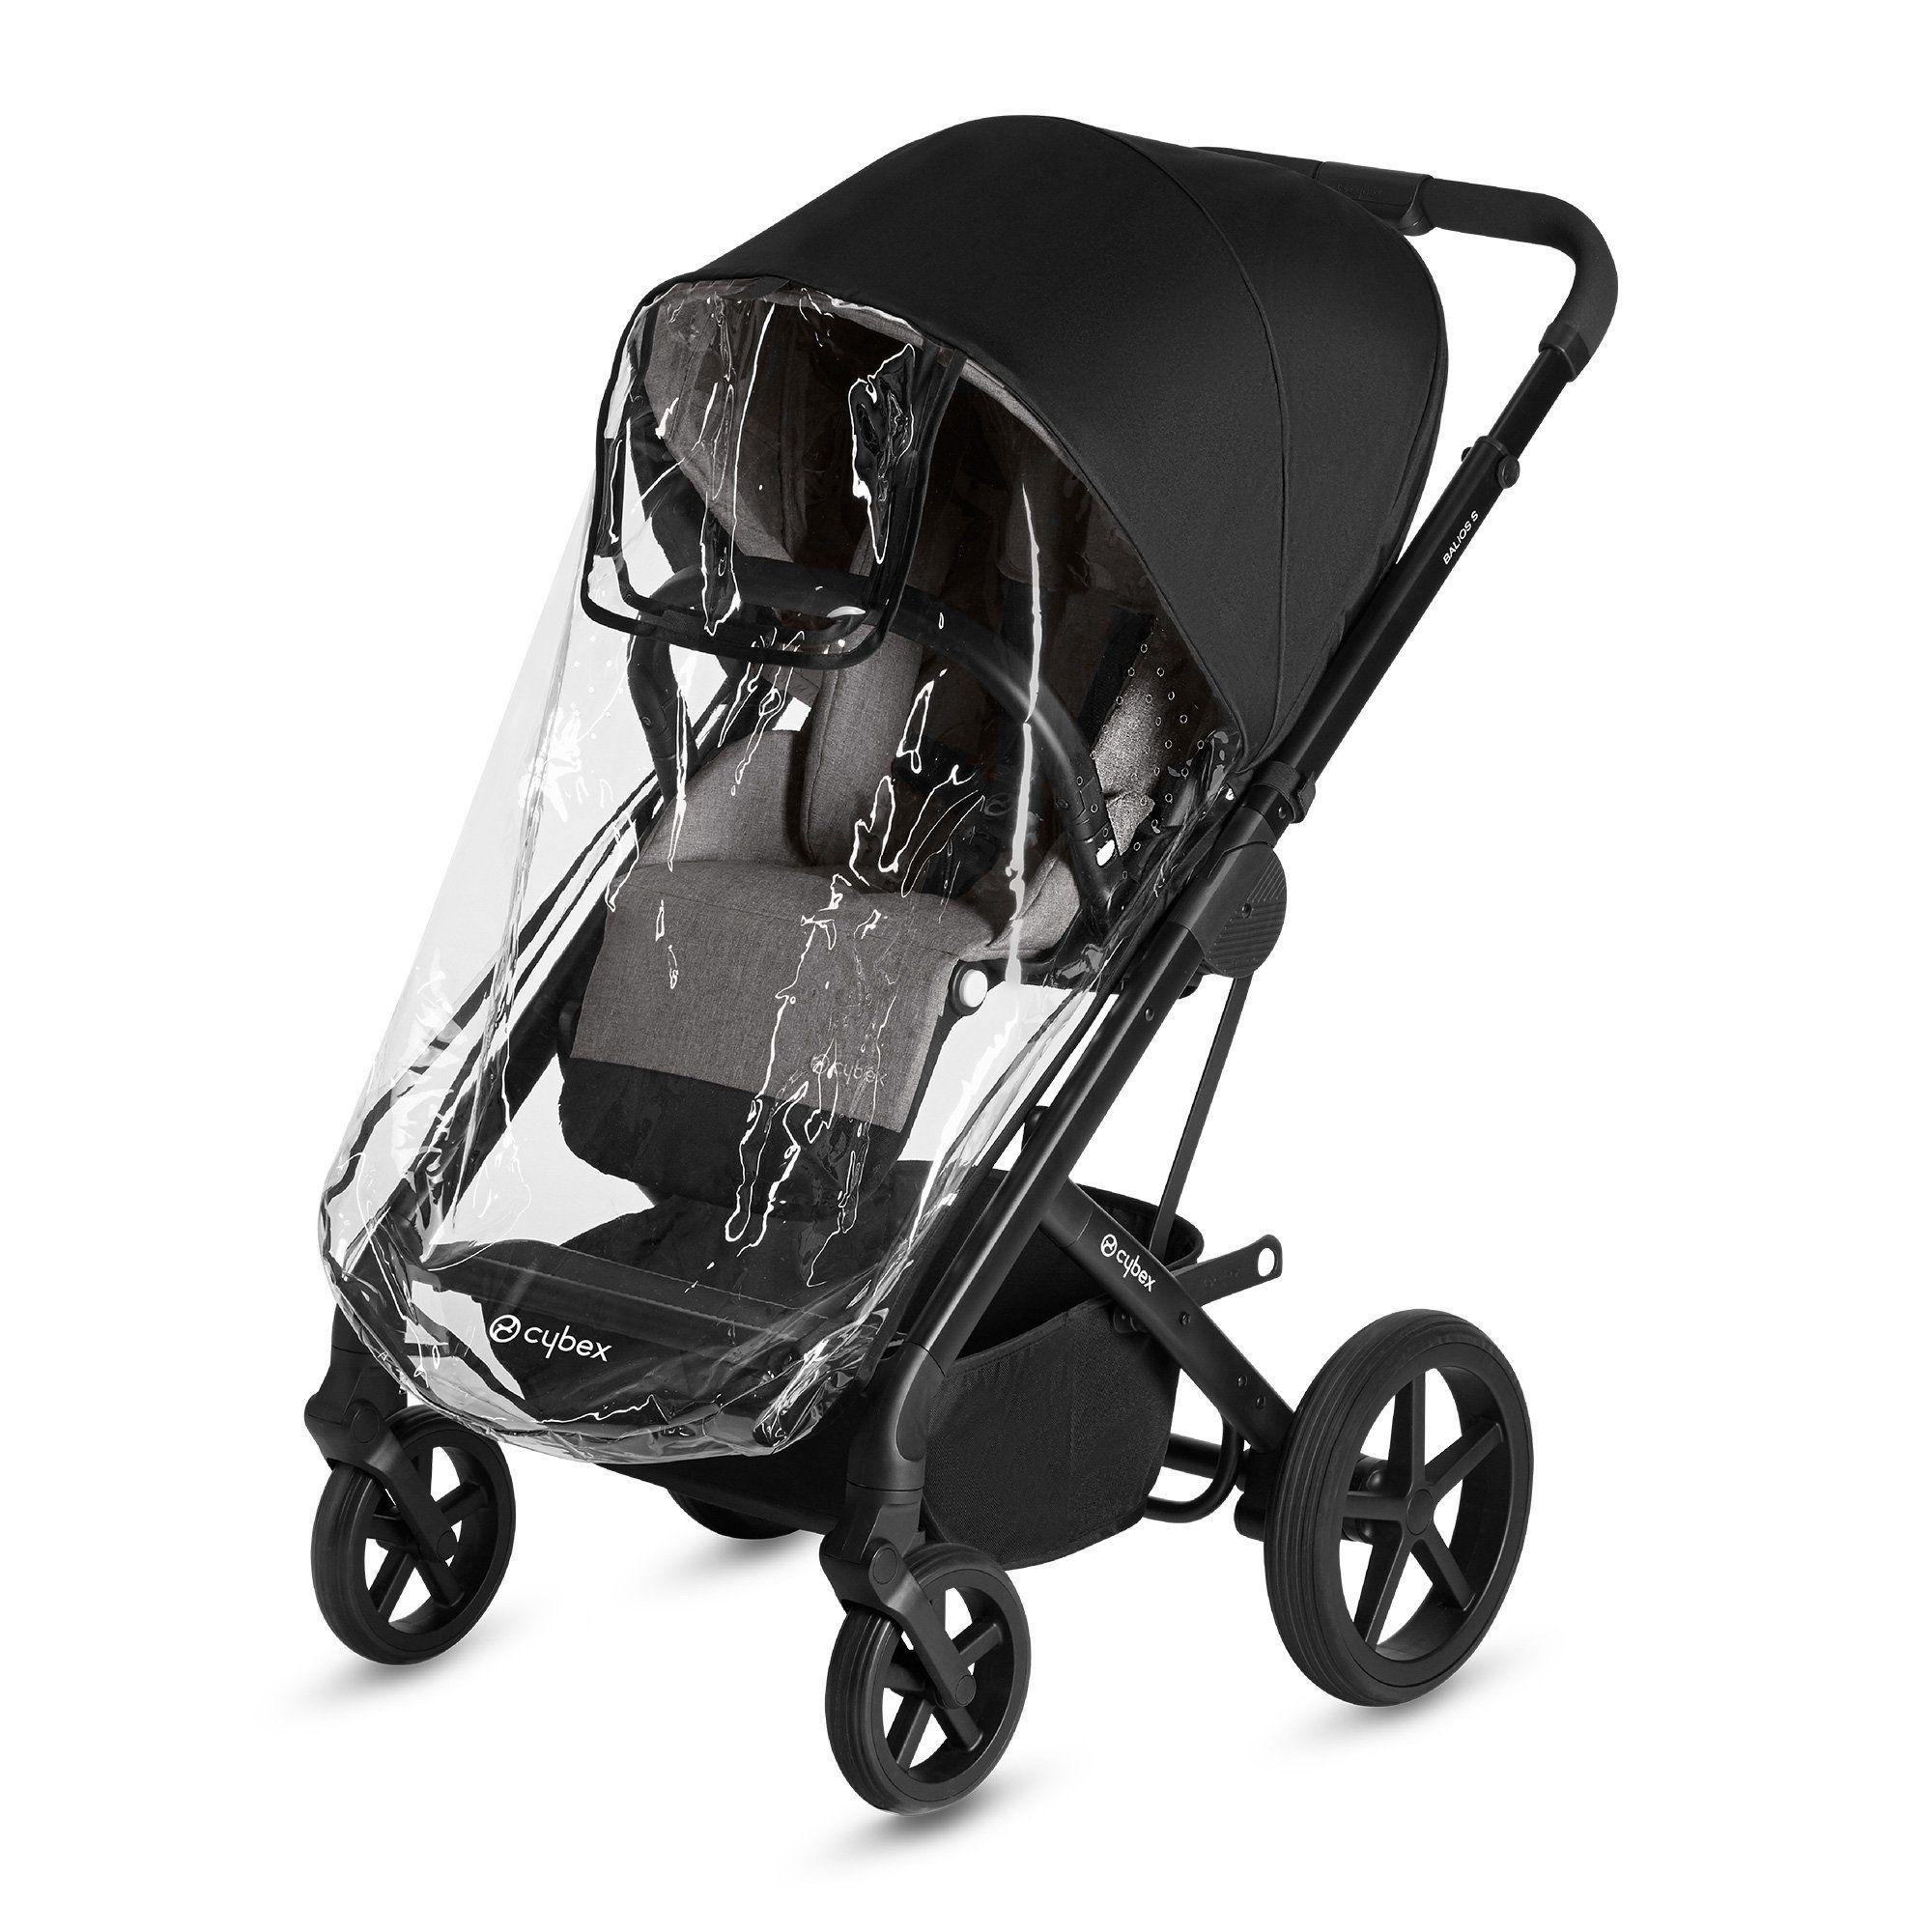 Raincover Balios S 518002121 CYBEX STORE Stroller